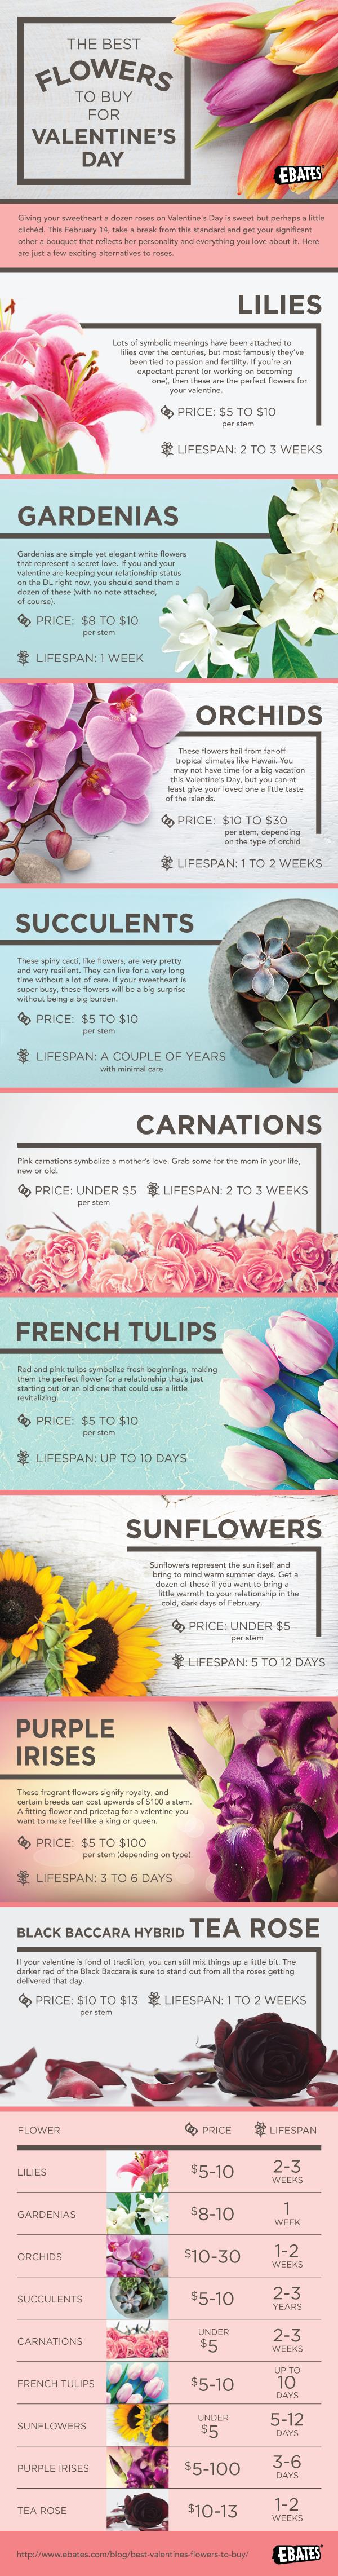 best-valentines-flowers-to-buy_IG